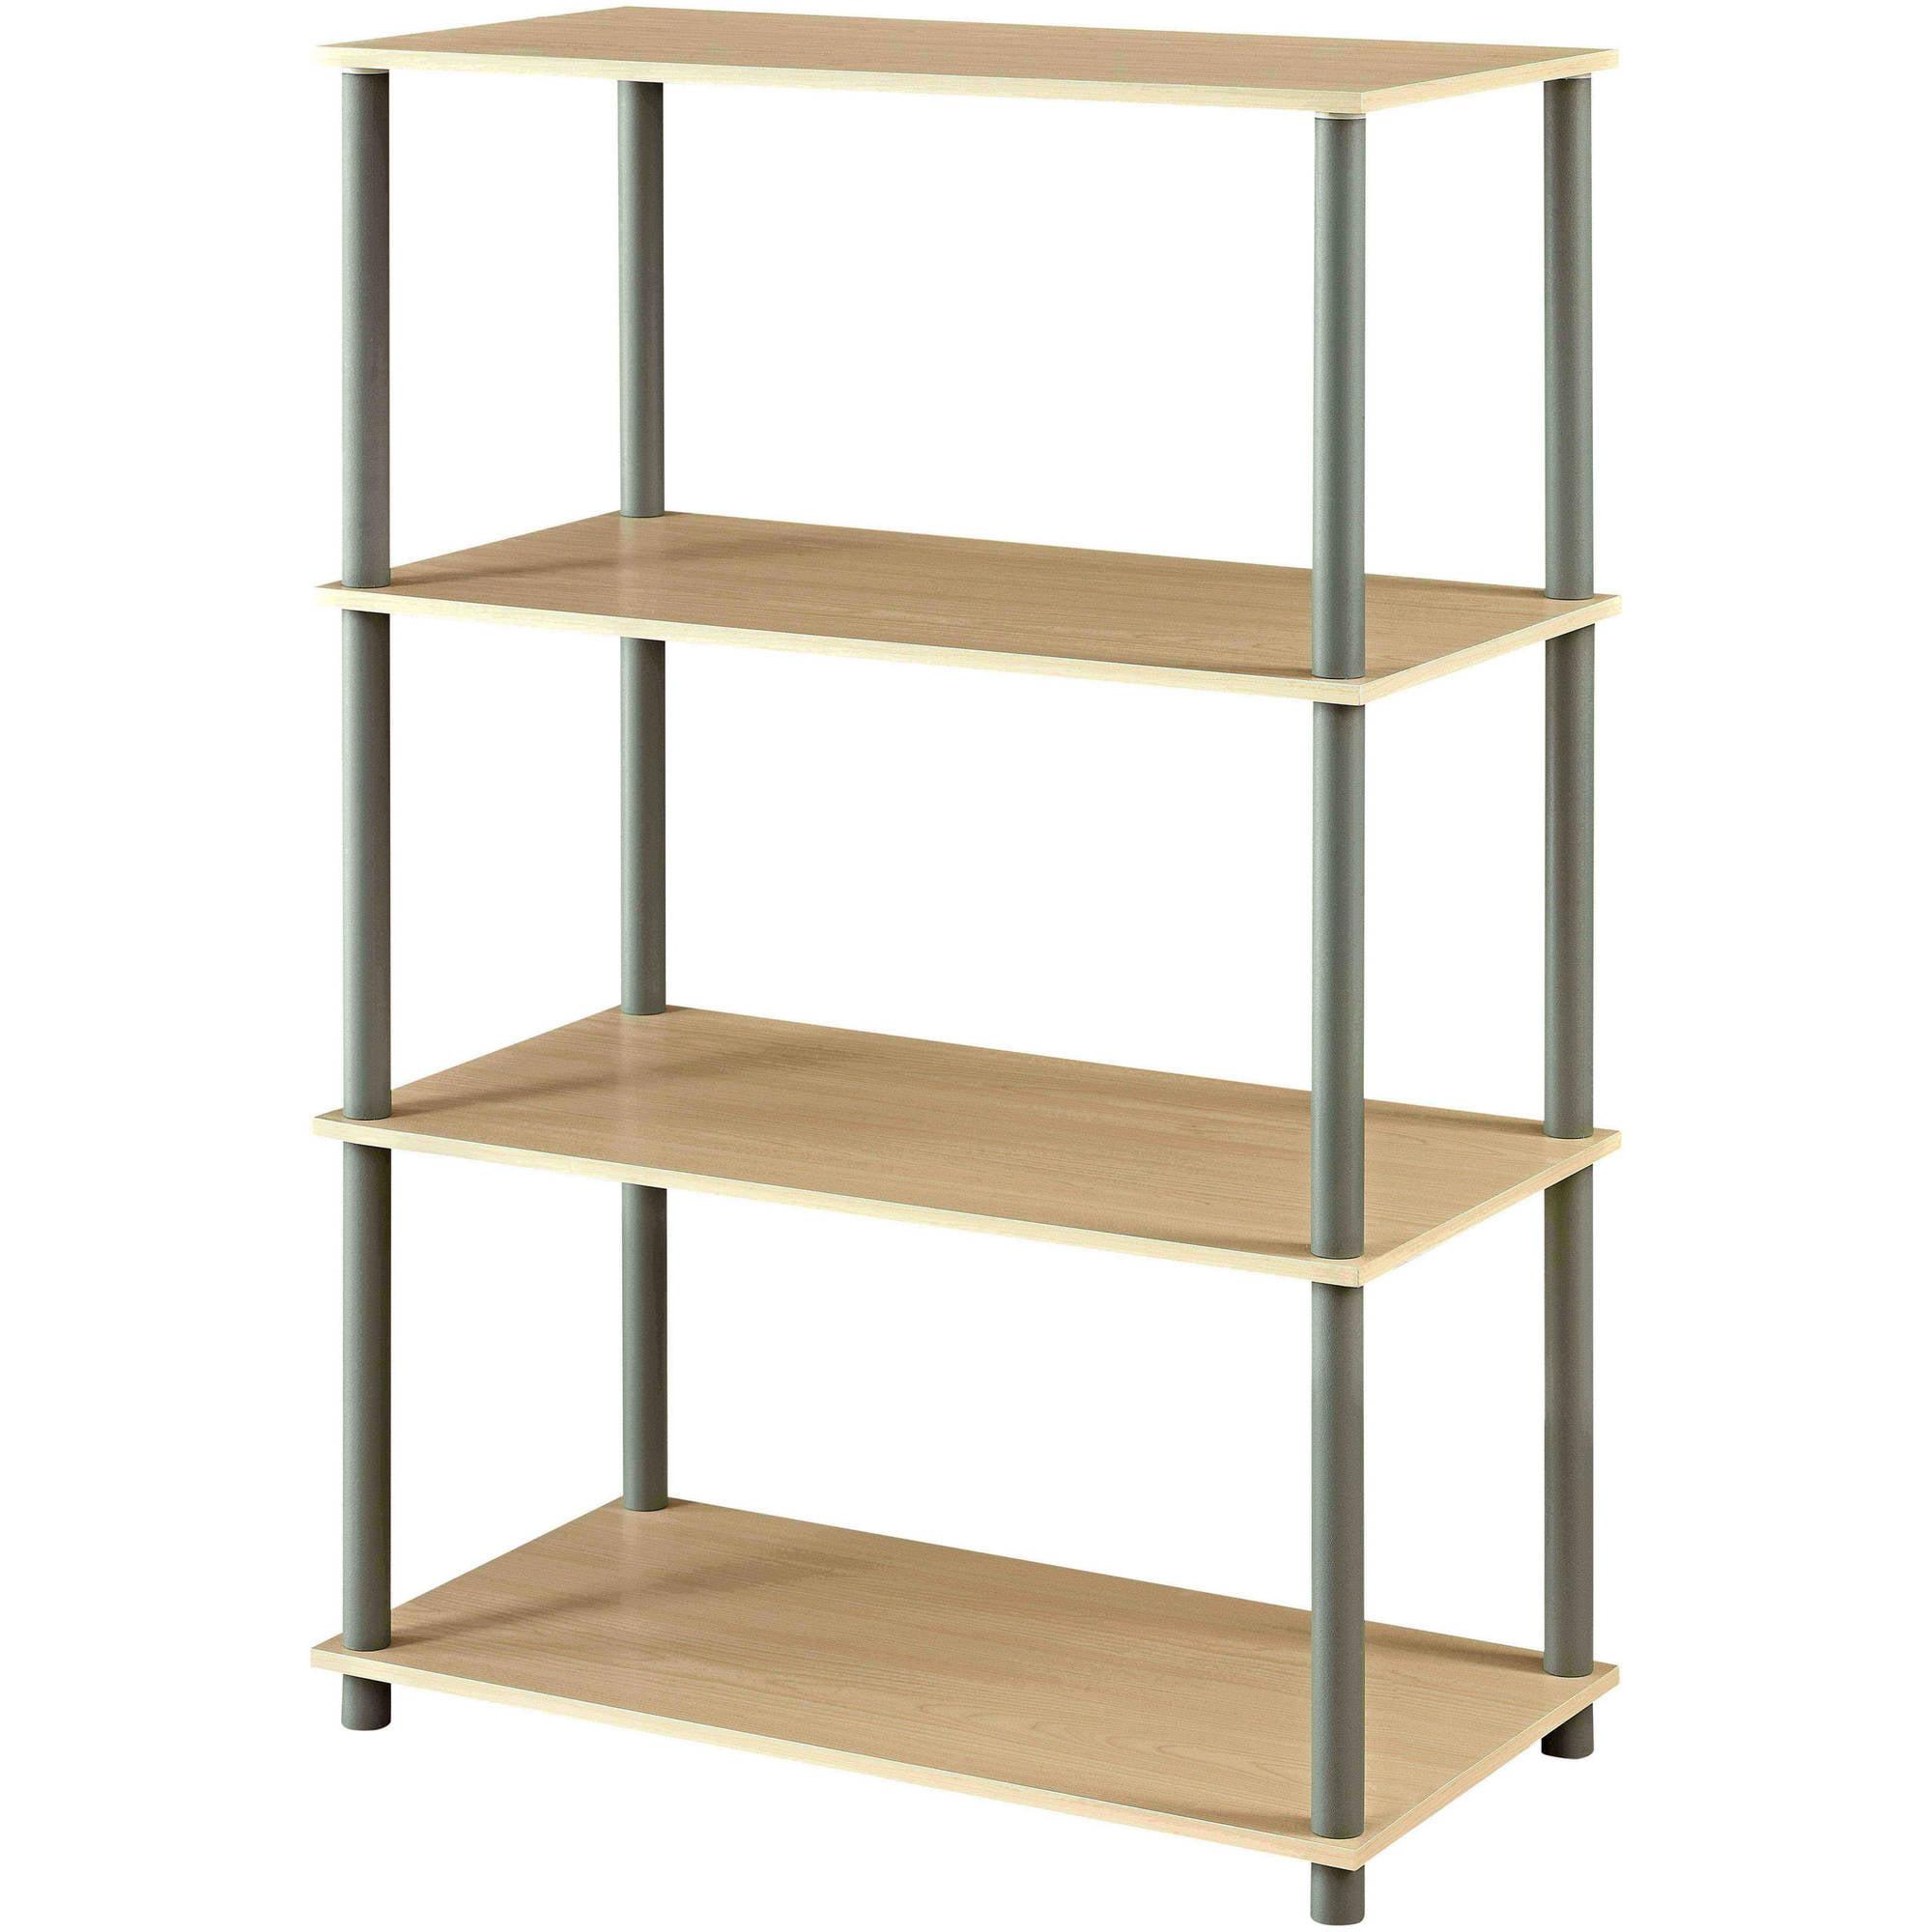 mainstays no tools 6cube standard storage shelf multiple colors walmartcom